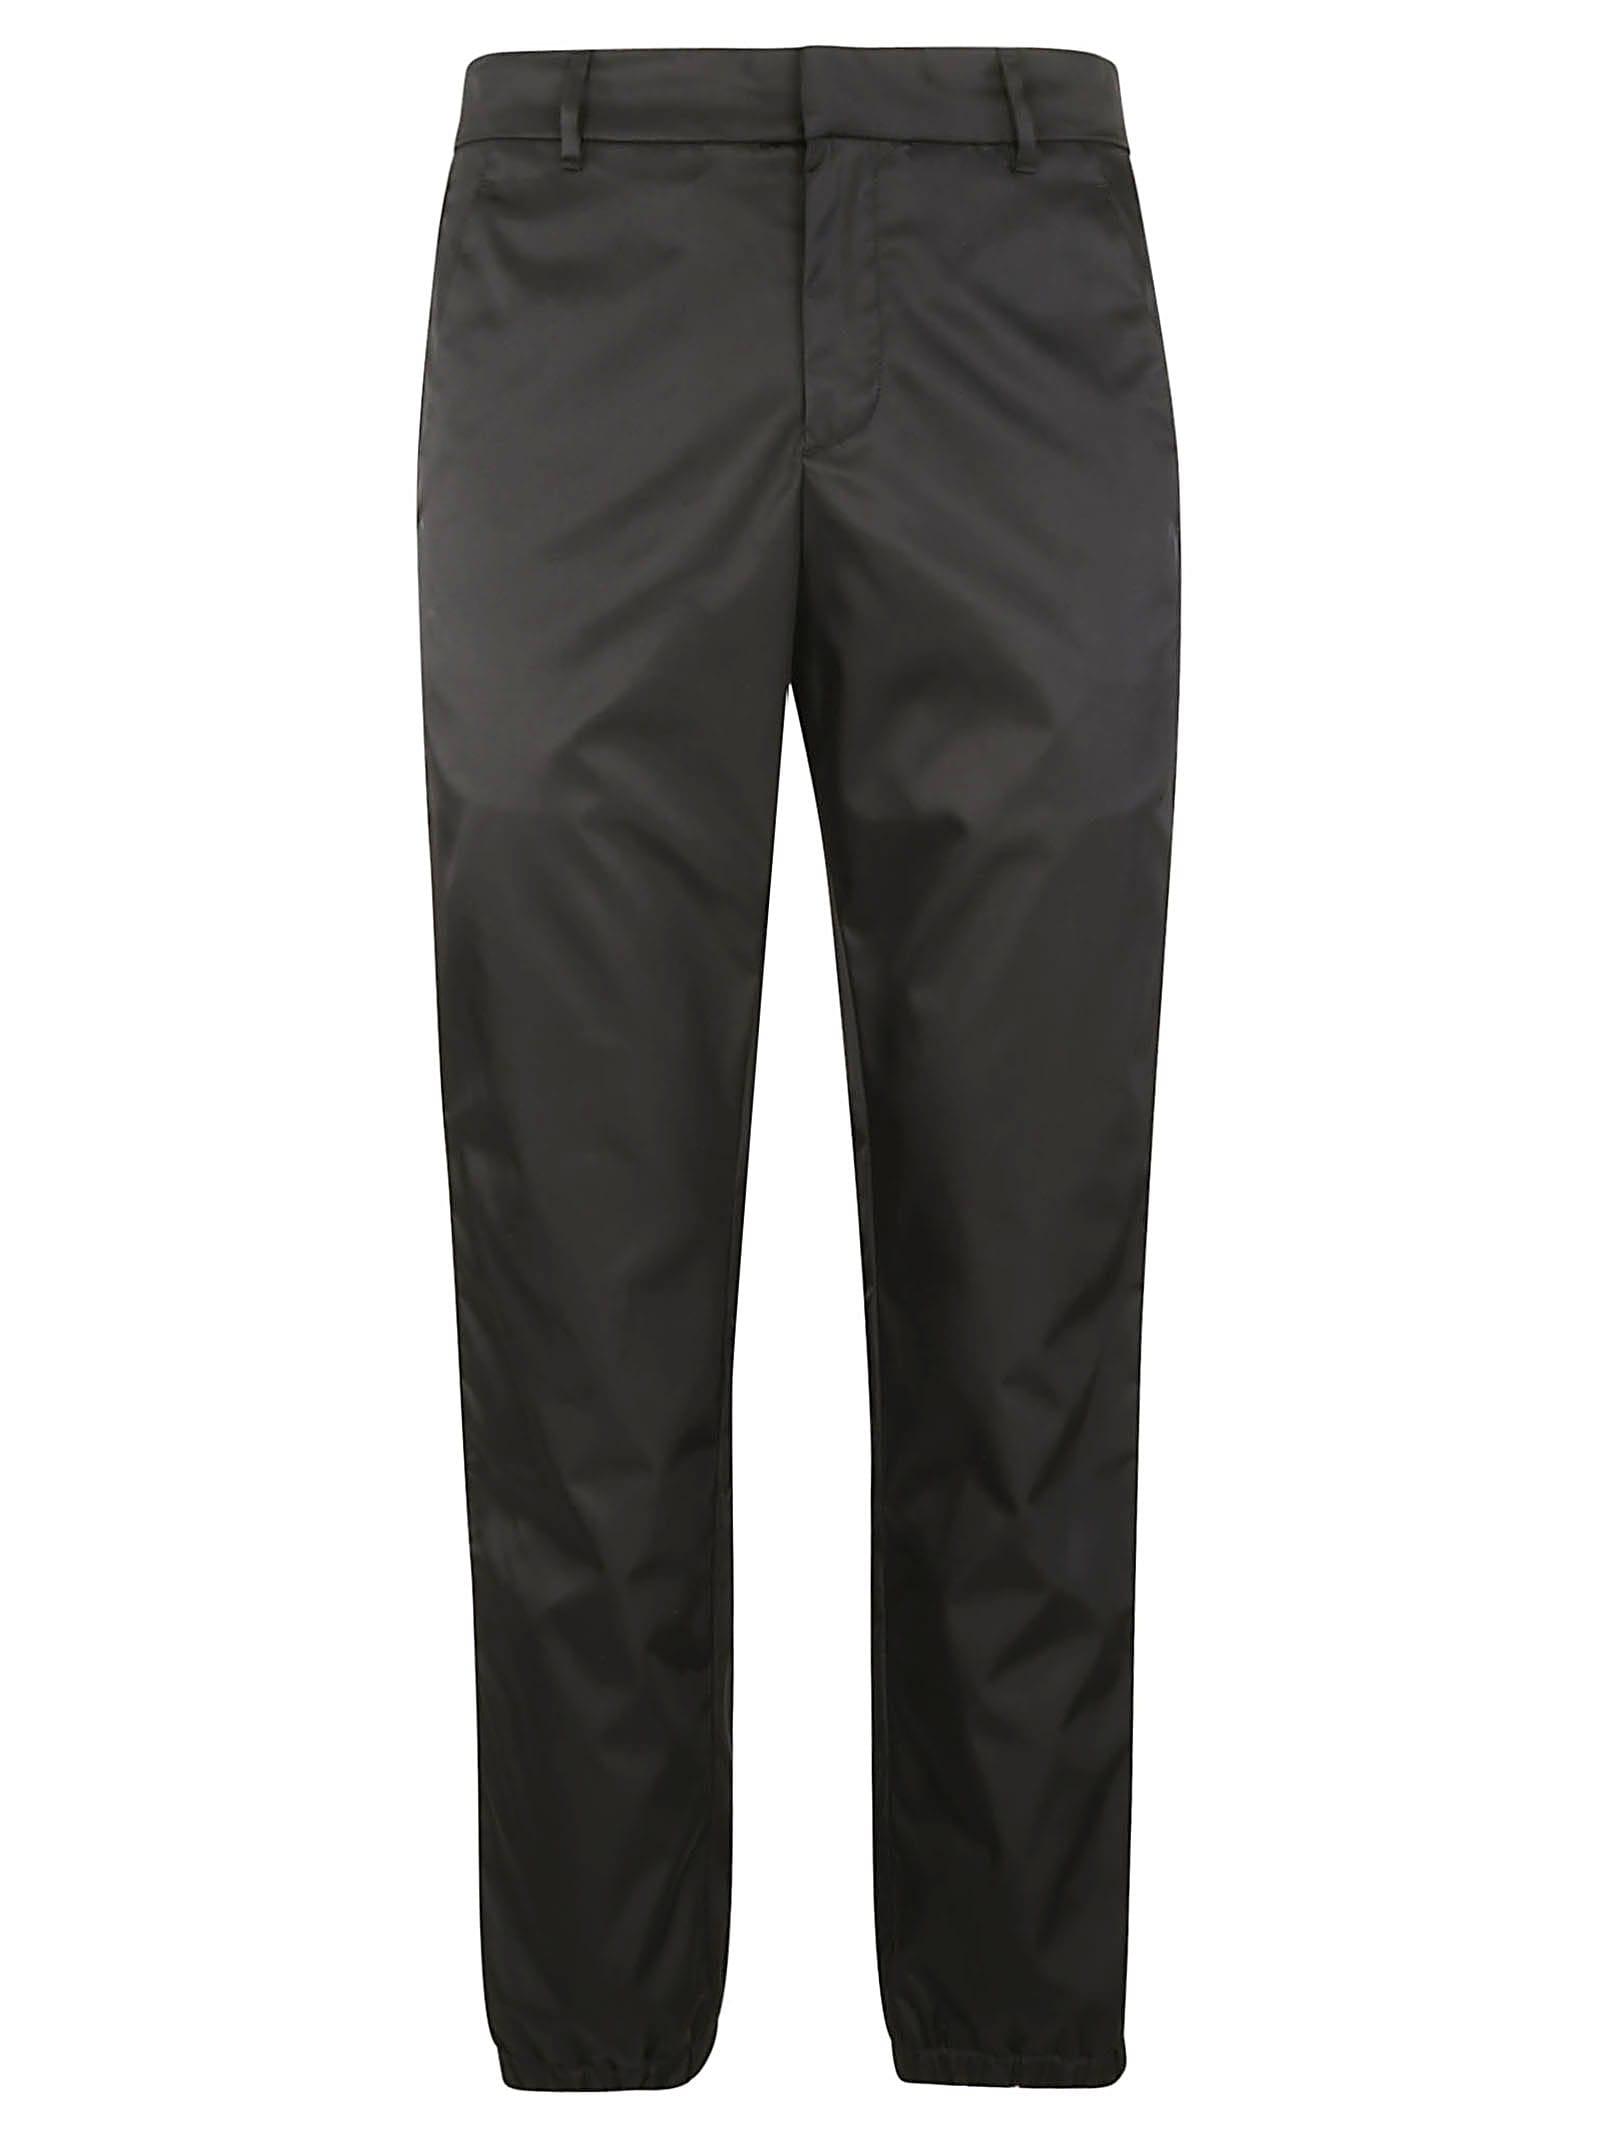 Prada Classic Straight Trousers